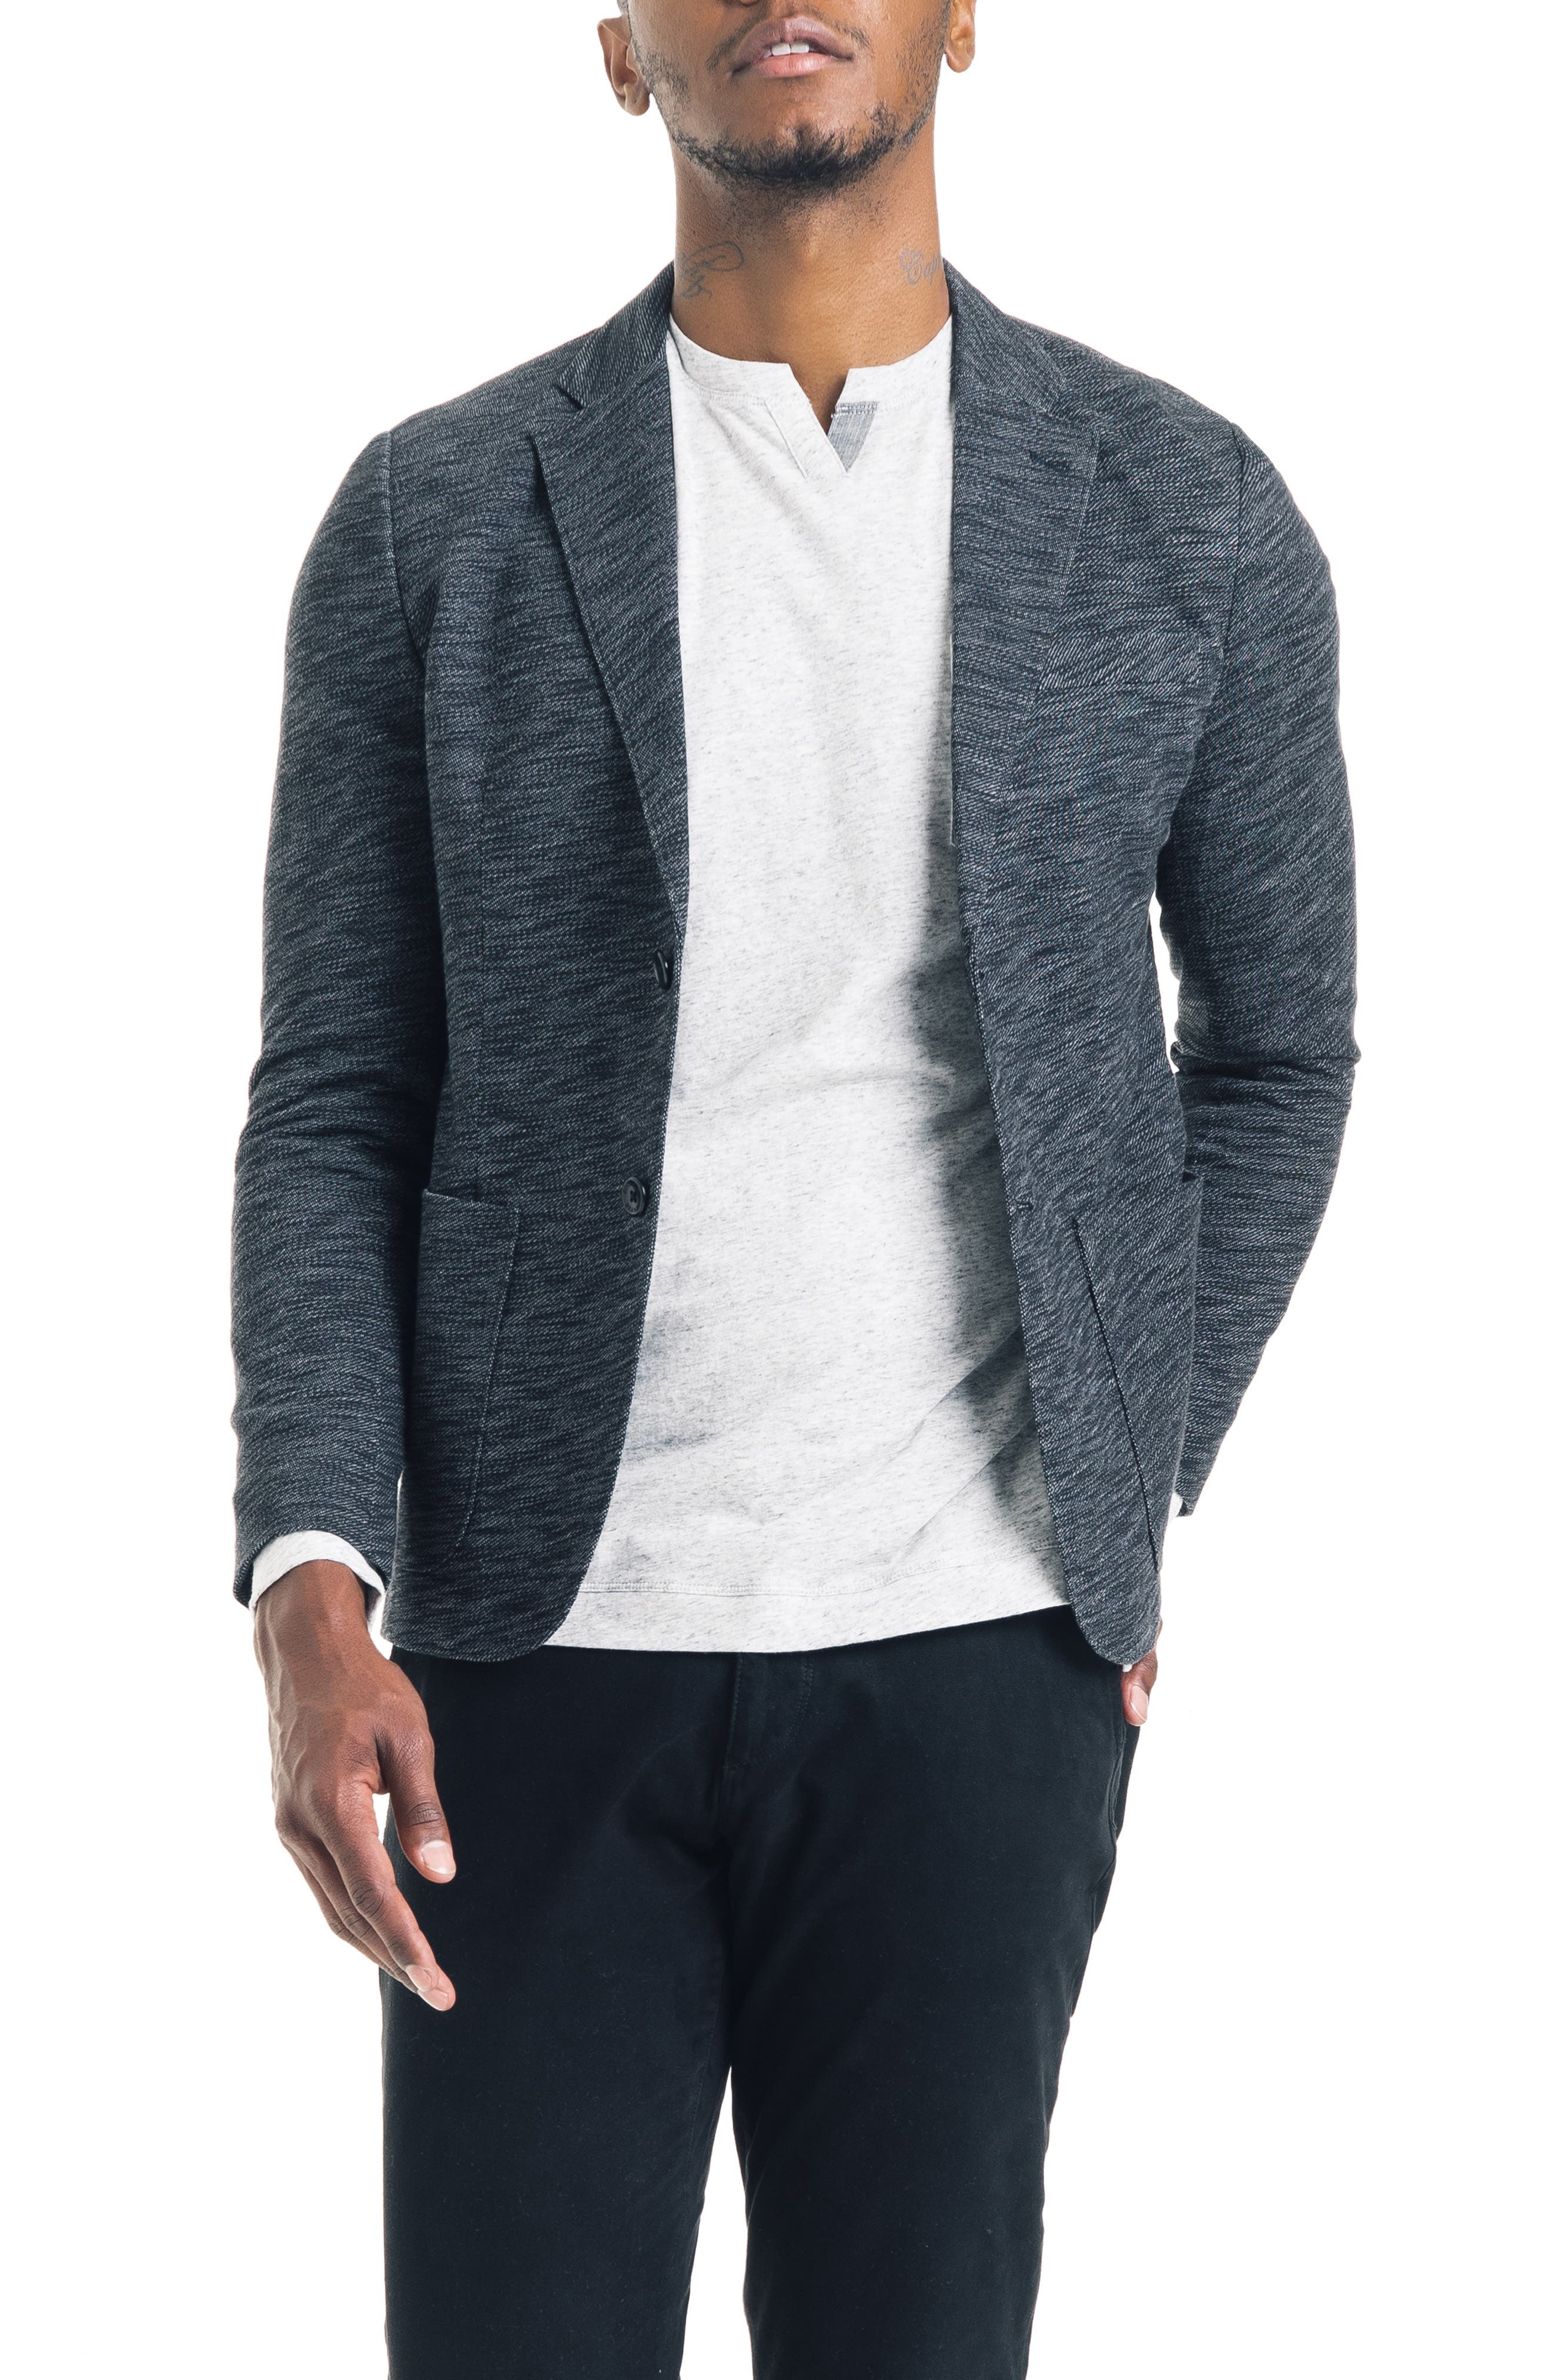 Slim Fit Vintage Twill Knit Blazer,                             Main thumbnail 1, color,                             BLACK / GREY HEATHER